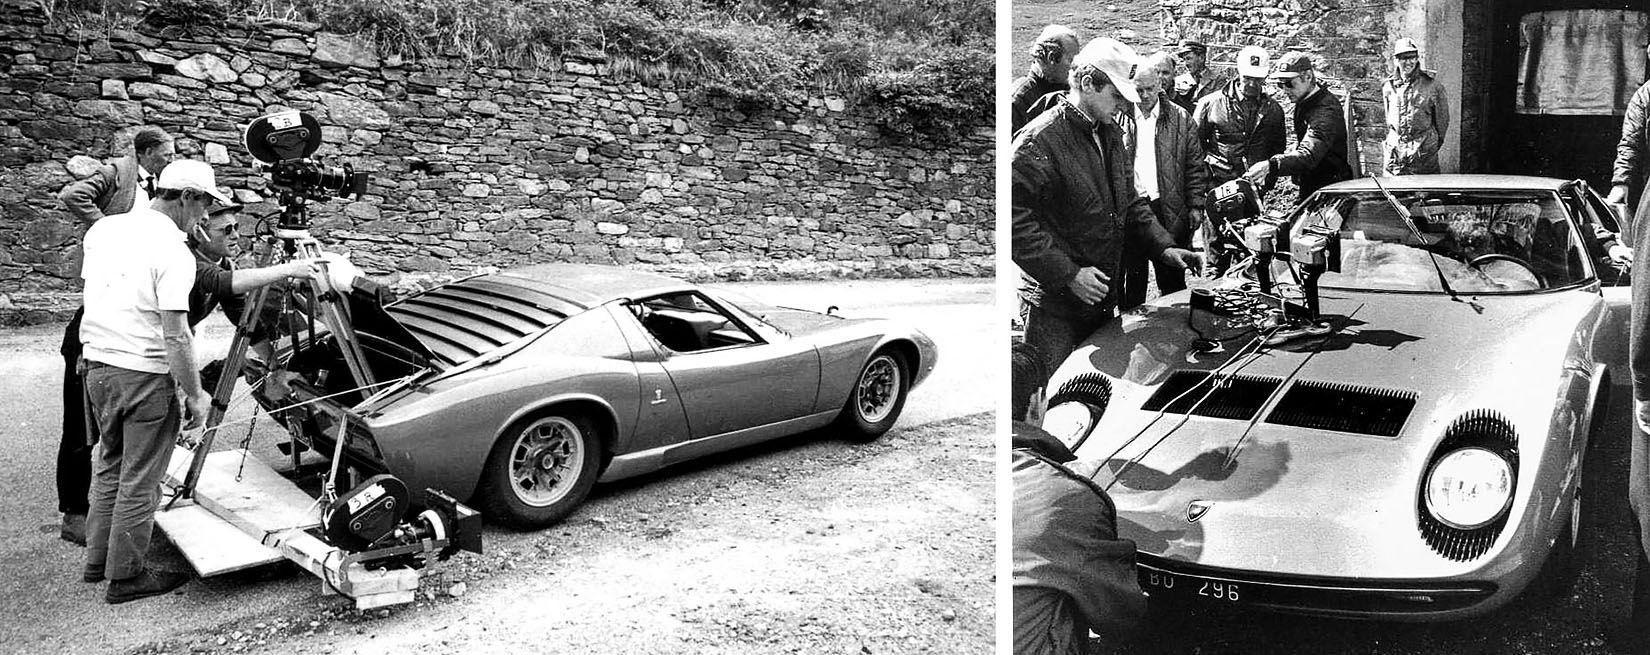 Pin By Jeff Horner On The Italian Job Lamborghini Miura Classic